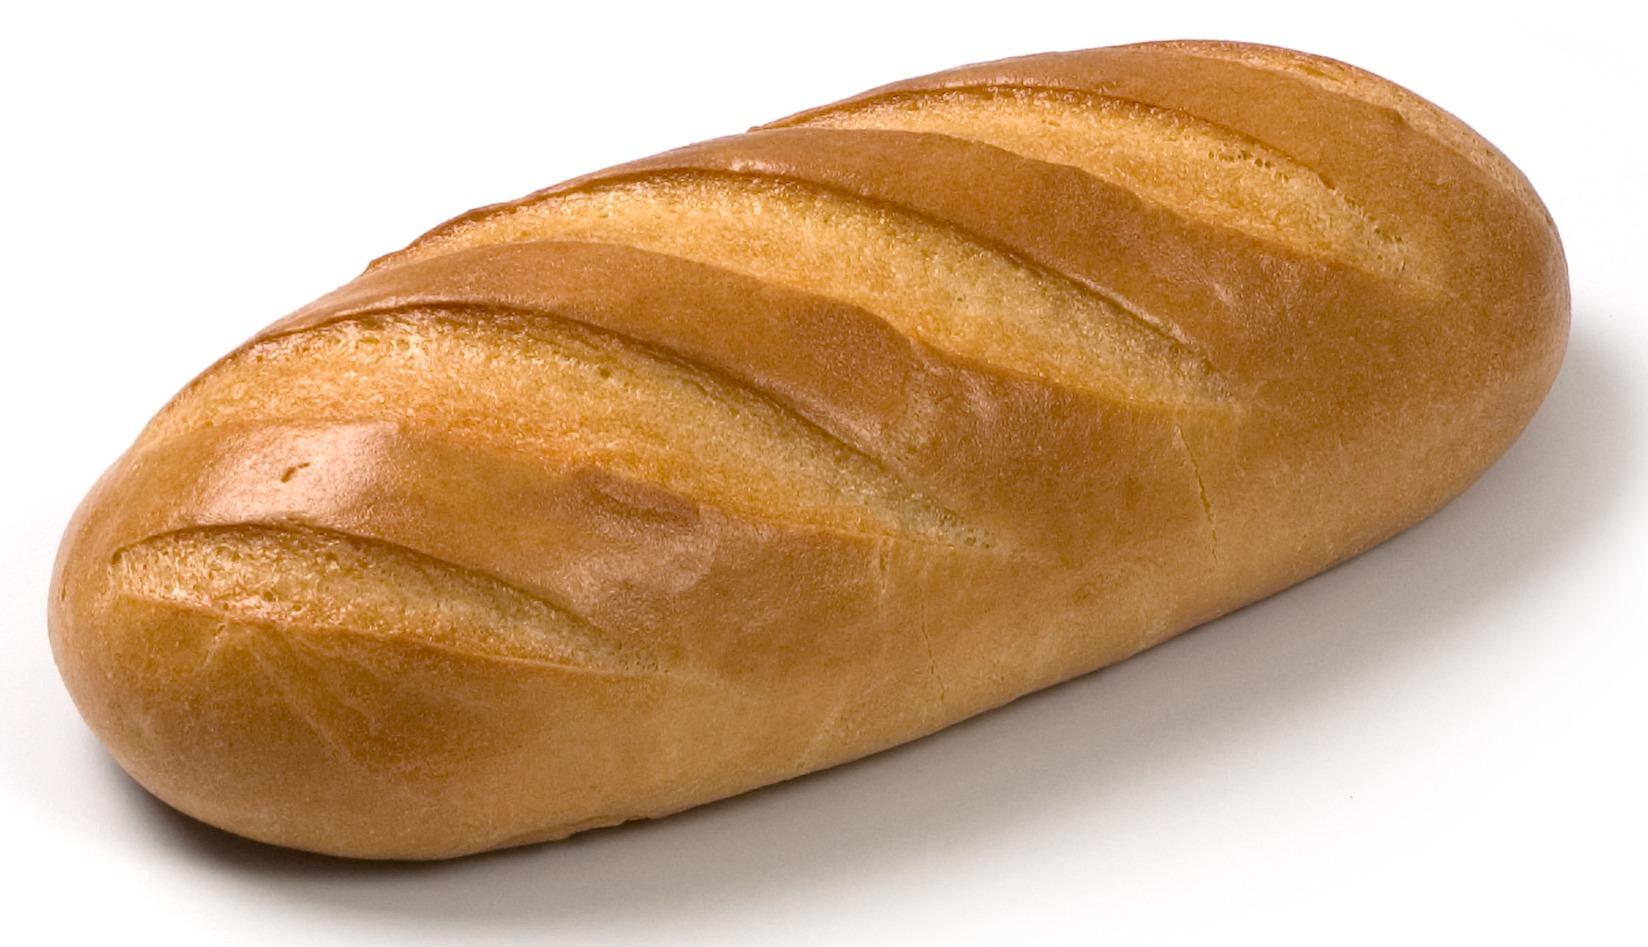 фото хлеба png